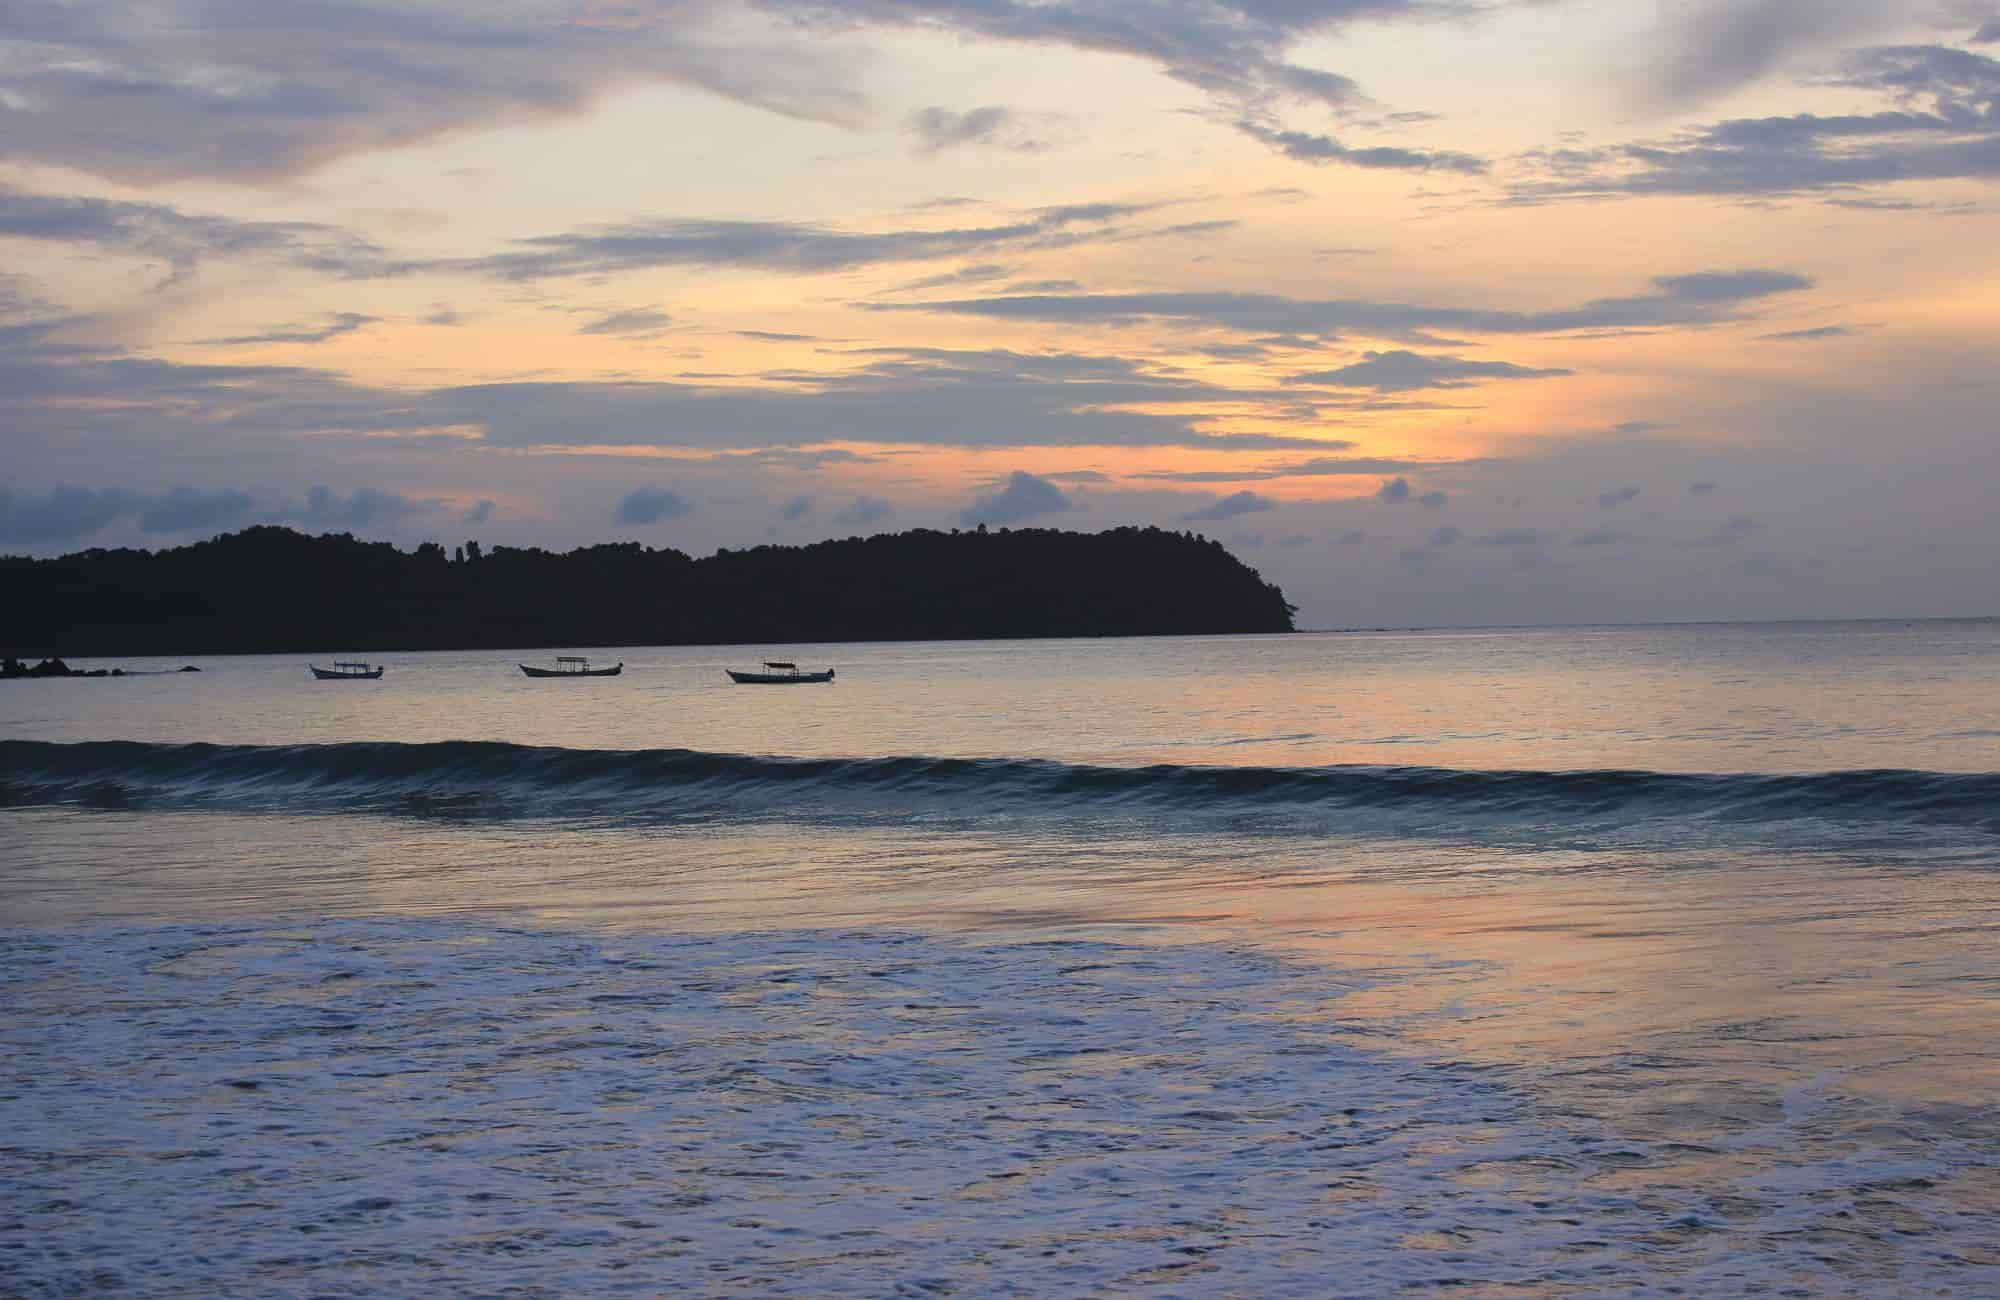 Voyage Birmanie - Ngapali mer - Amplitudes